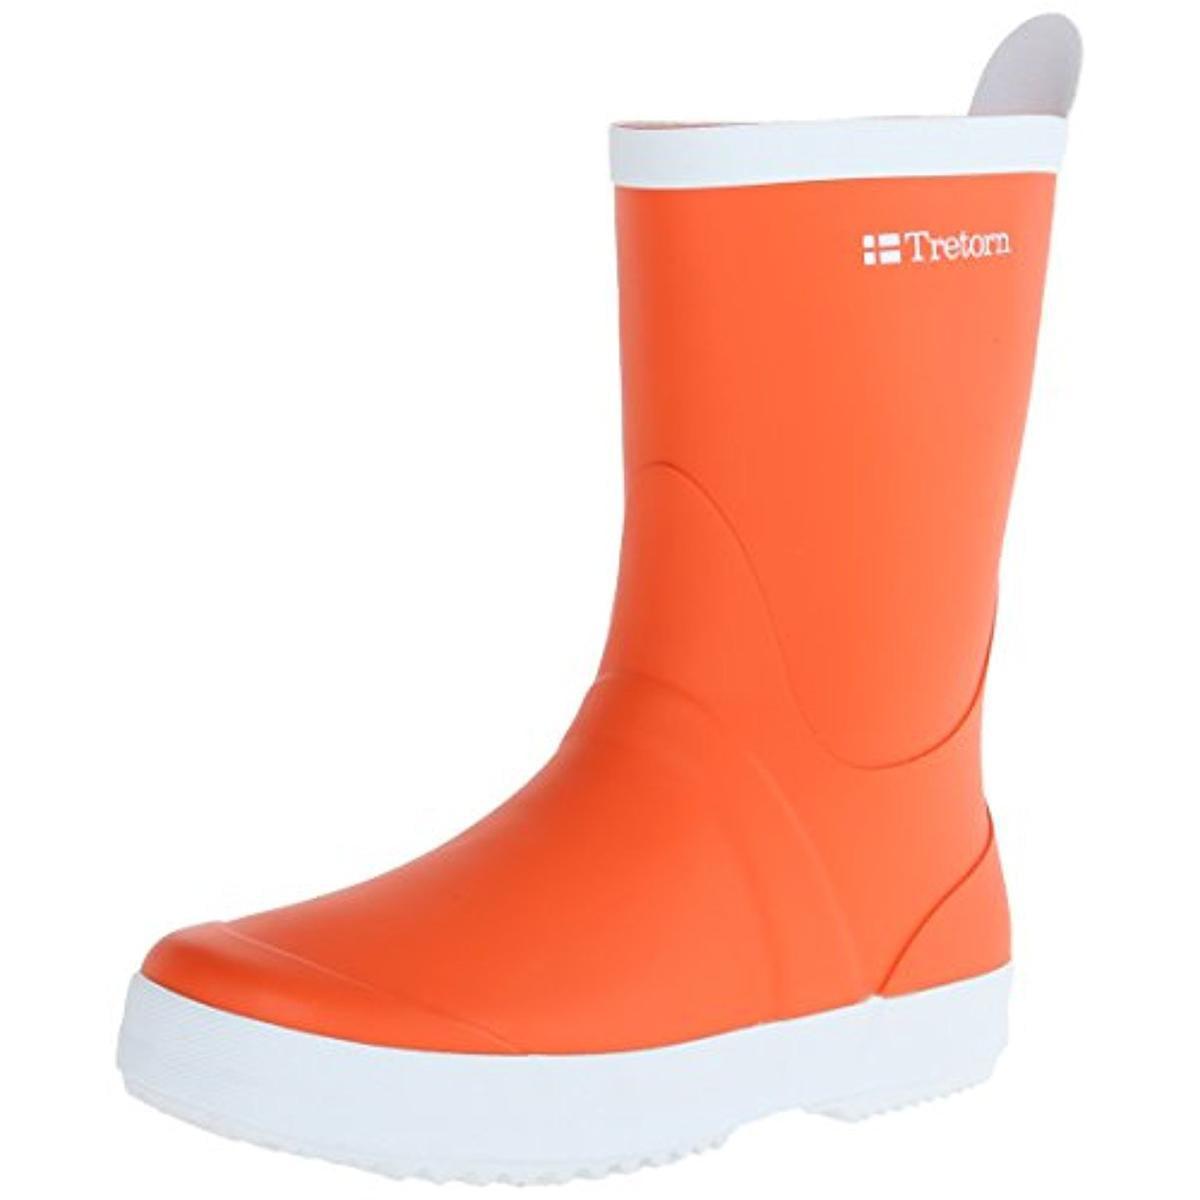 Tretorn Mens Wings Rubber Mid-Calf Rain Boots by Tretorn